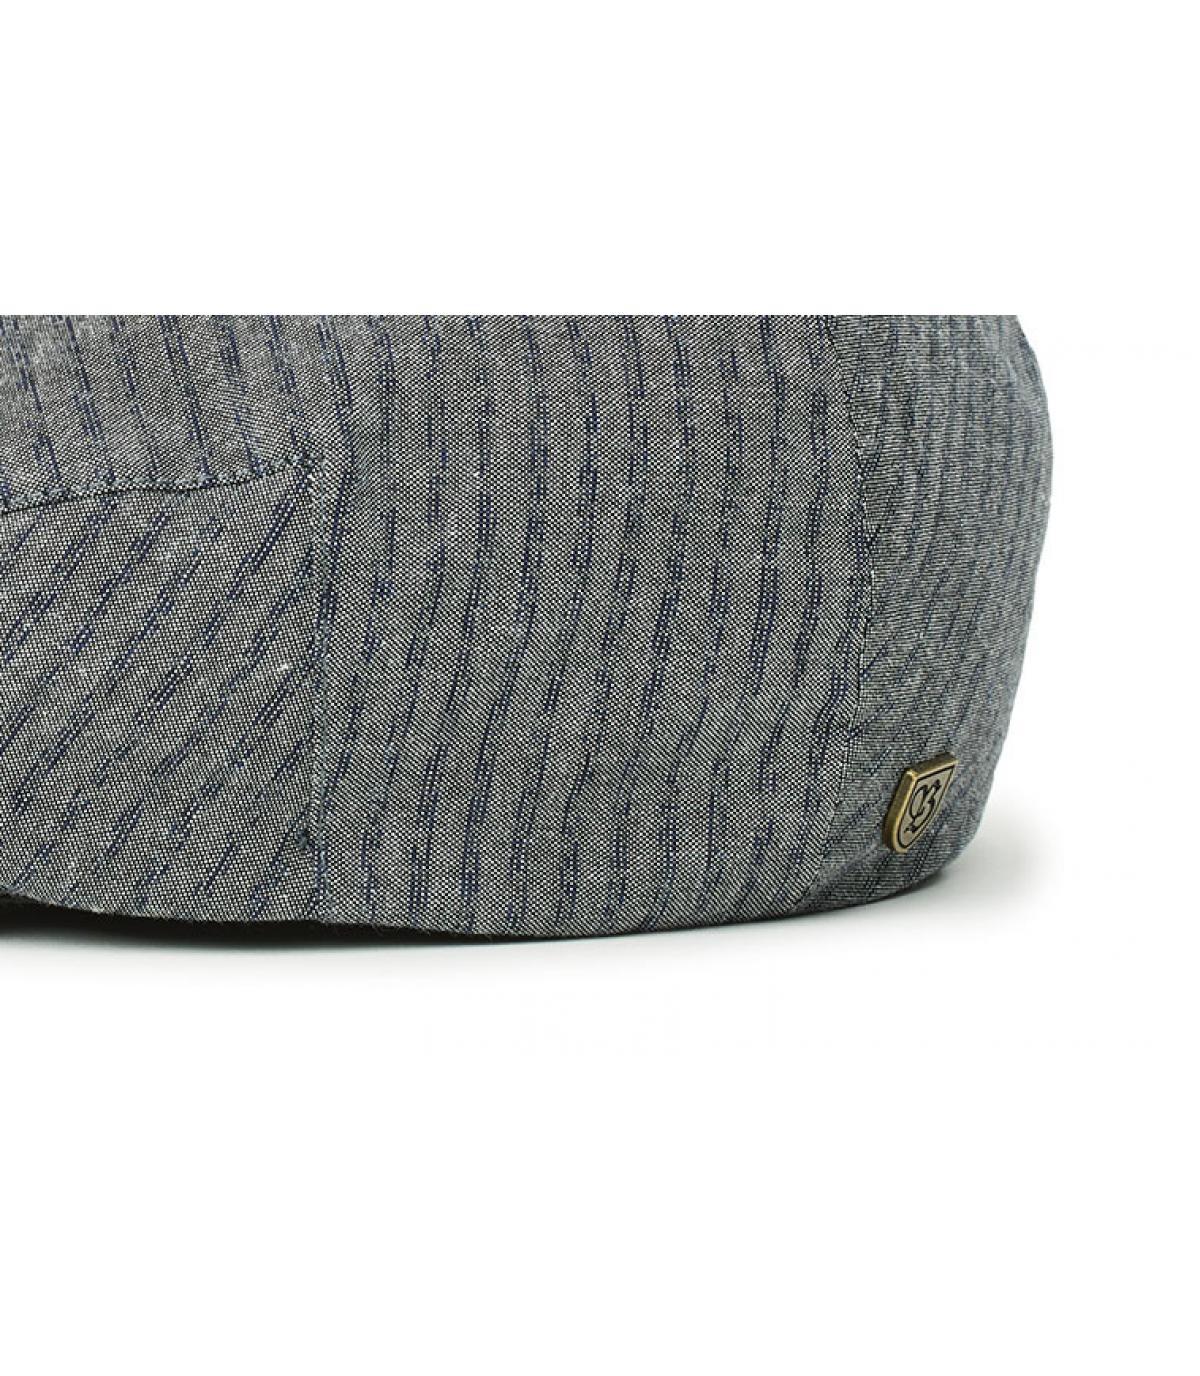 Détails Hooligan grey navy - image 3